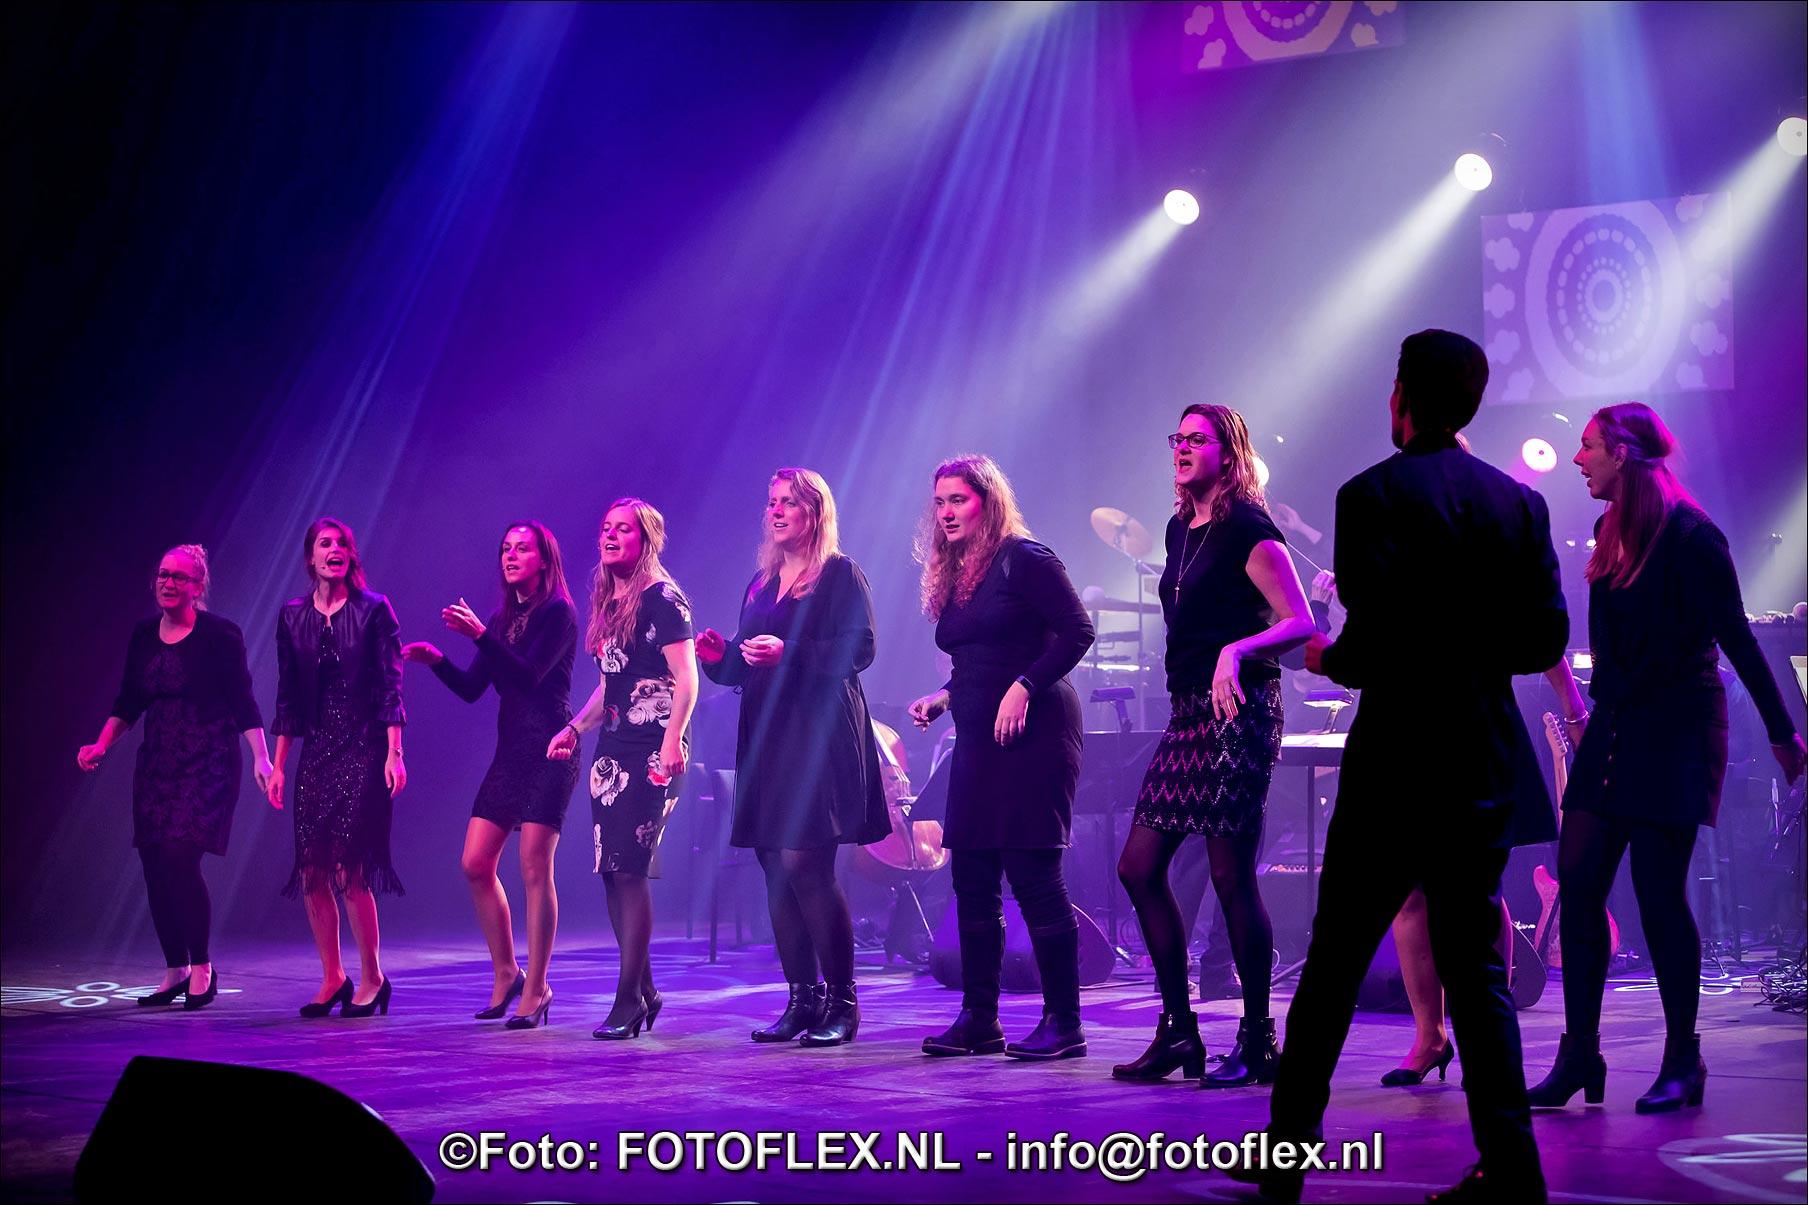 0410-CopyrightFOTOFLEX.NL07012020